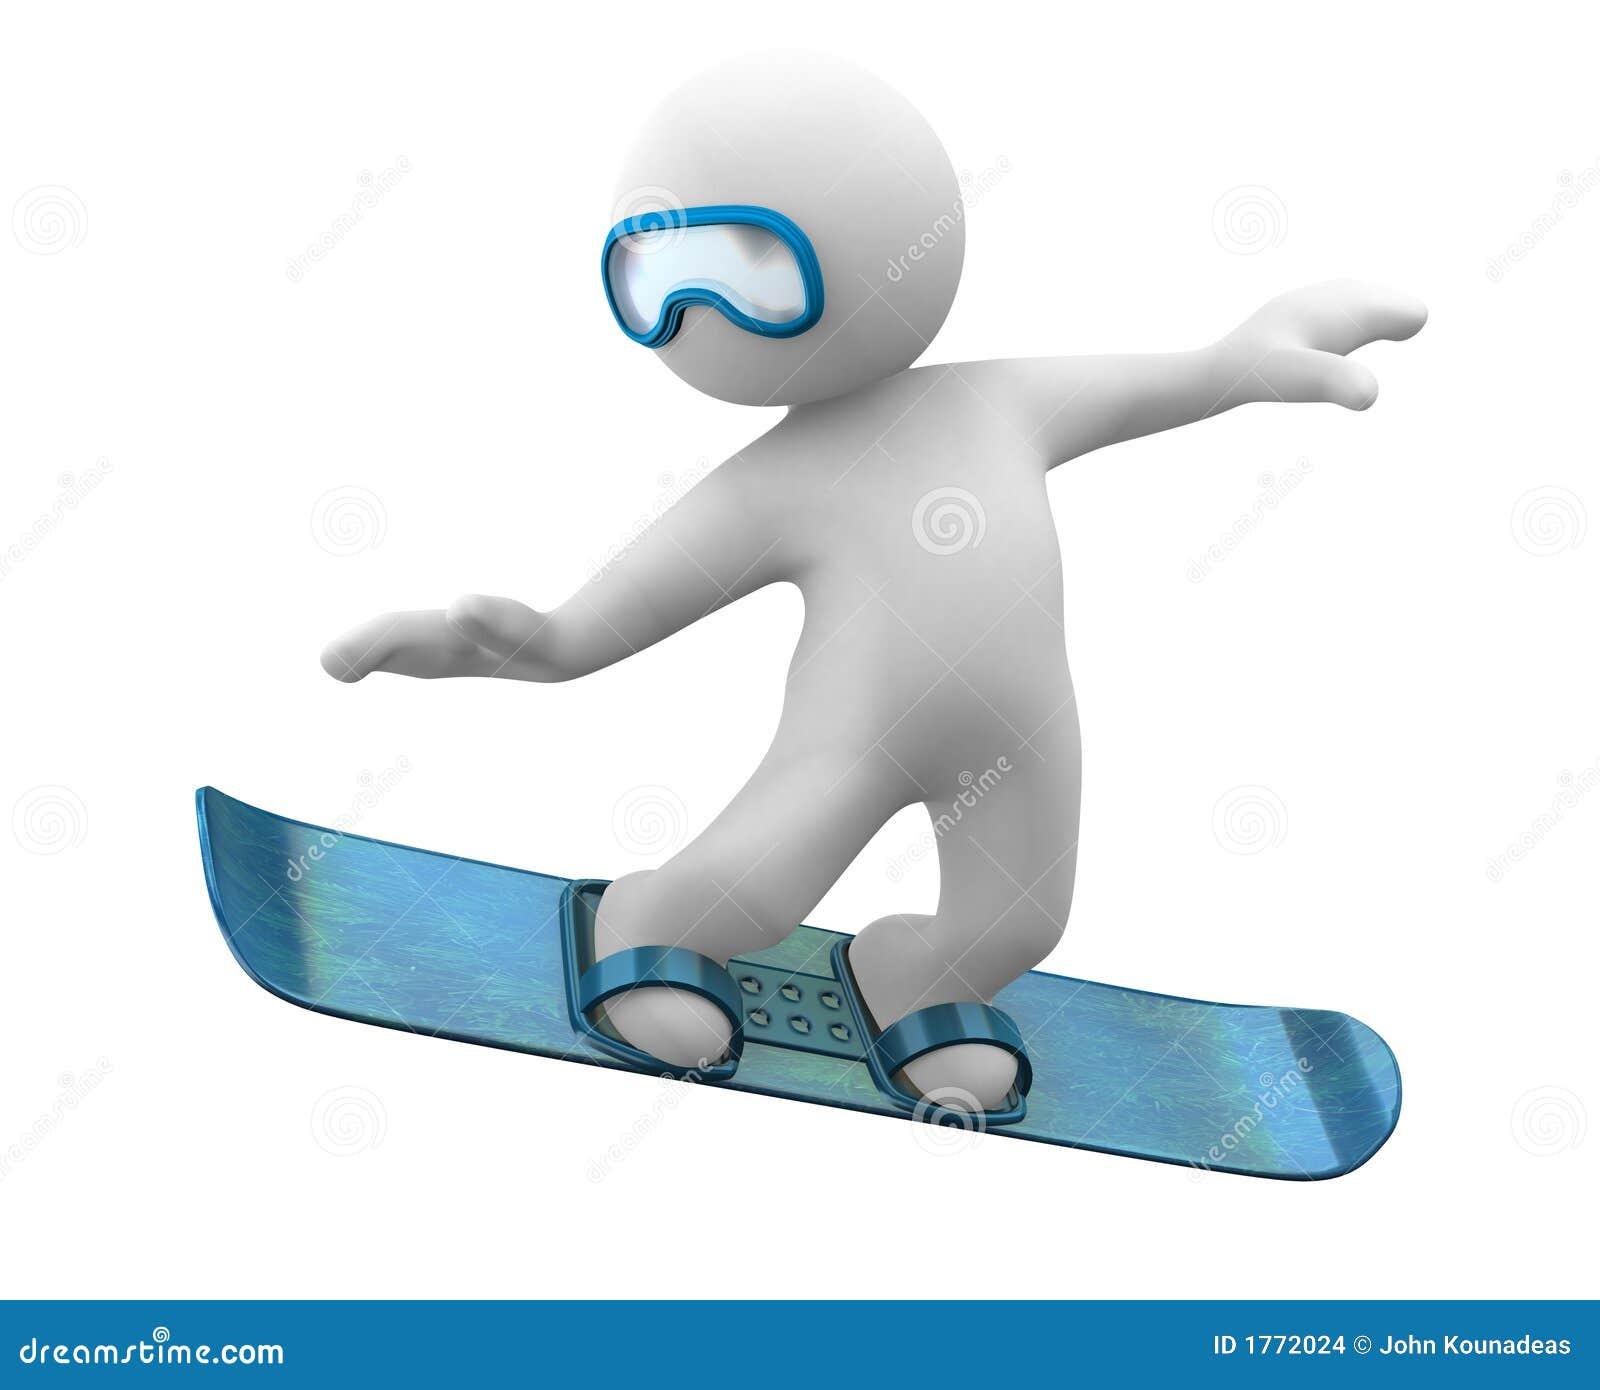 Snowboard Stock Illustrations – 5,209 Snowboard Stock ...